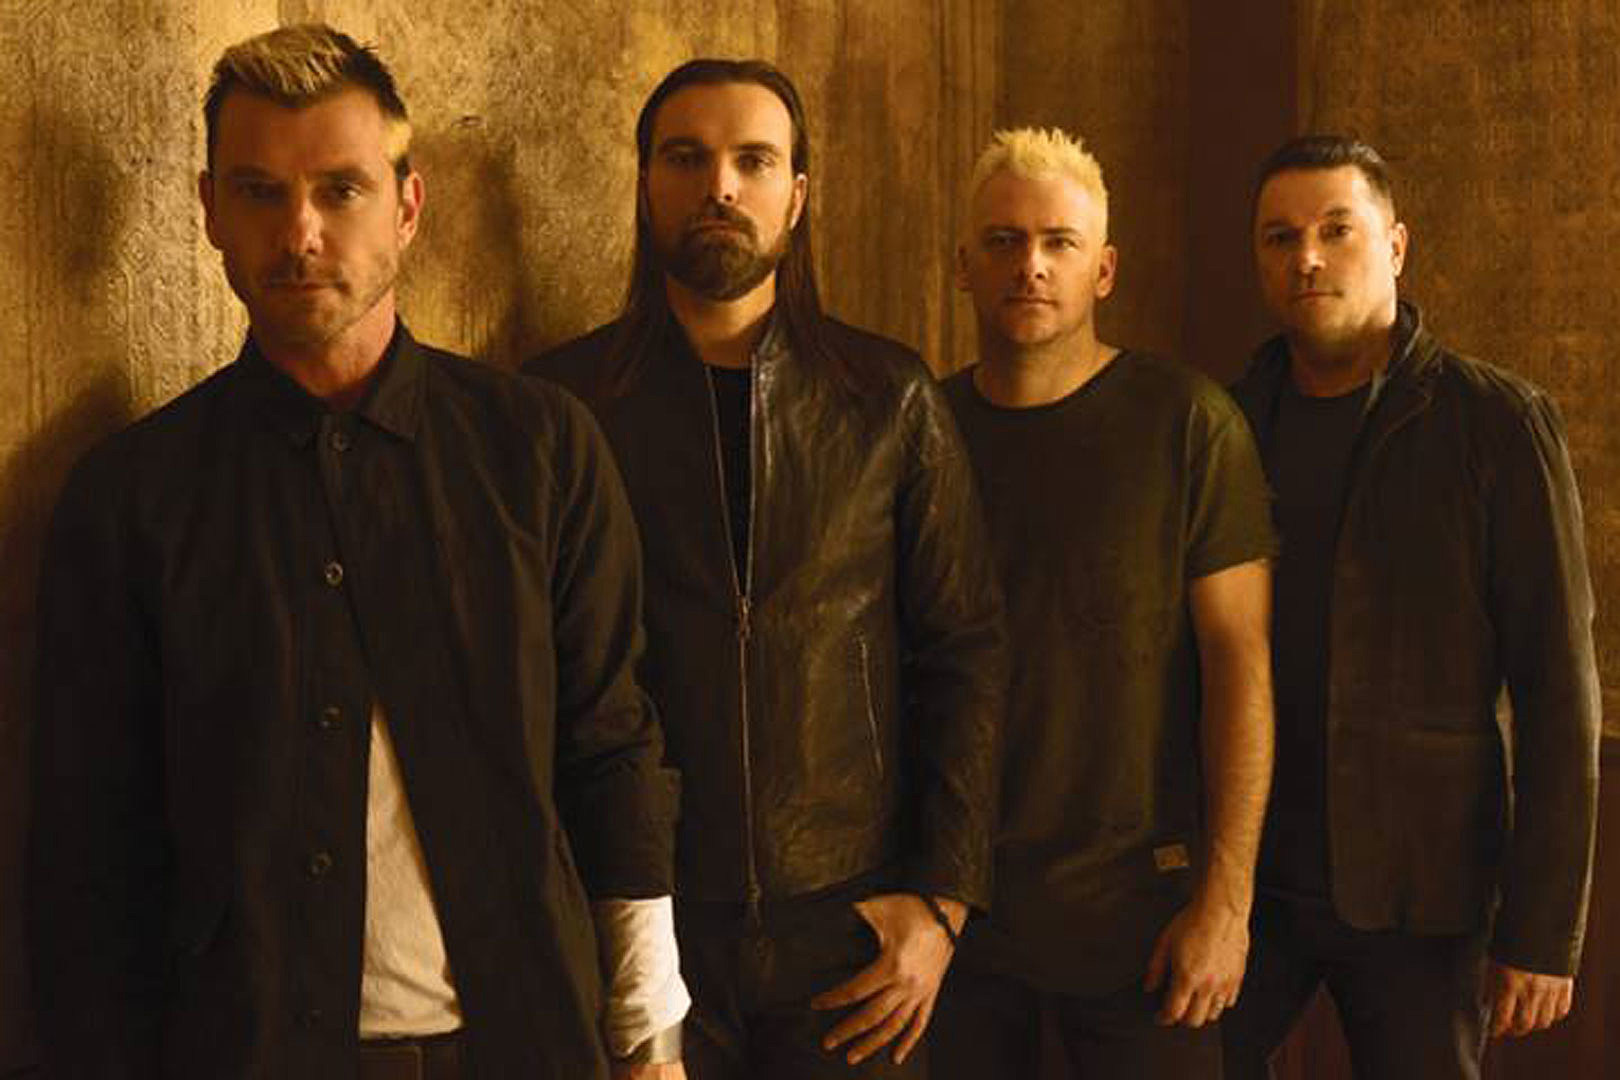 Bush Working With Marilyn Manson Guitarist on 'Heavy' New Album